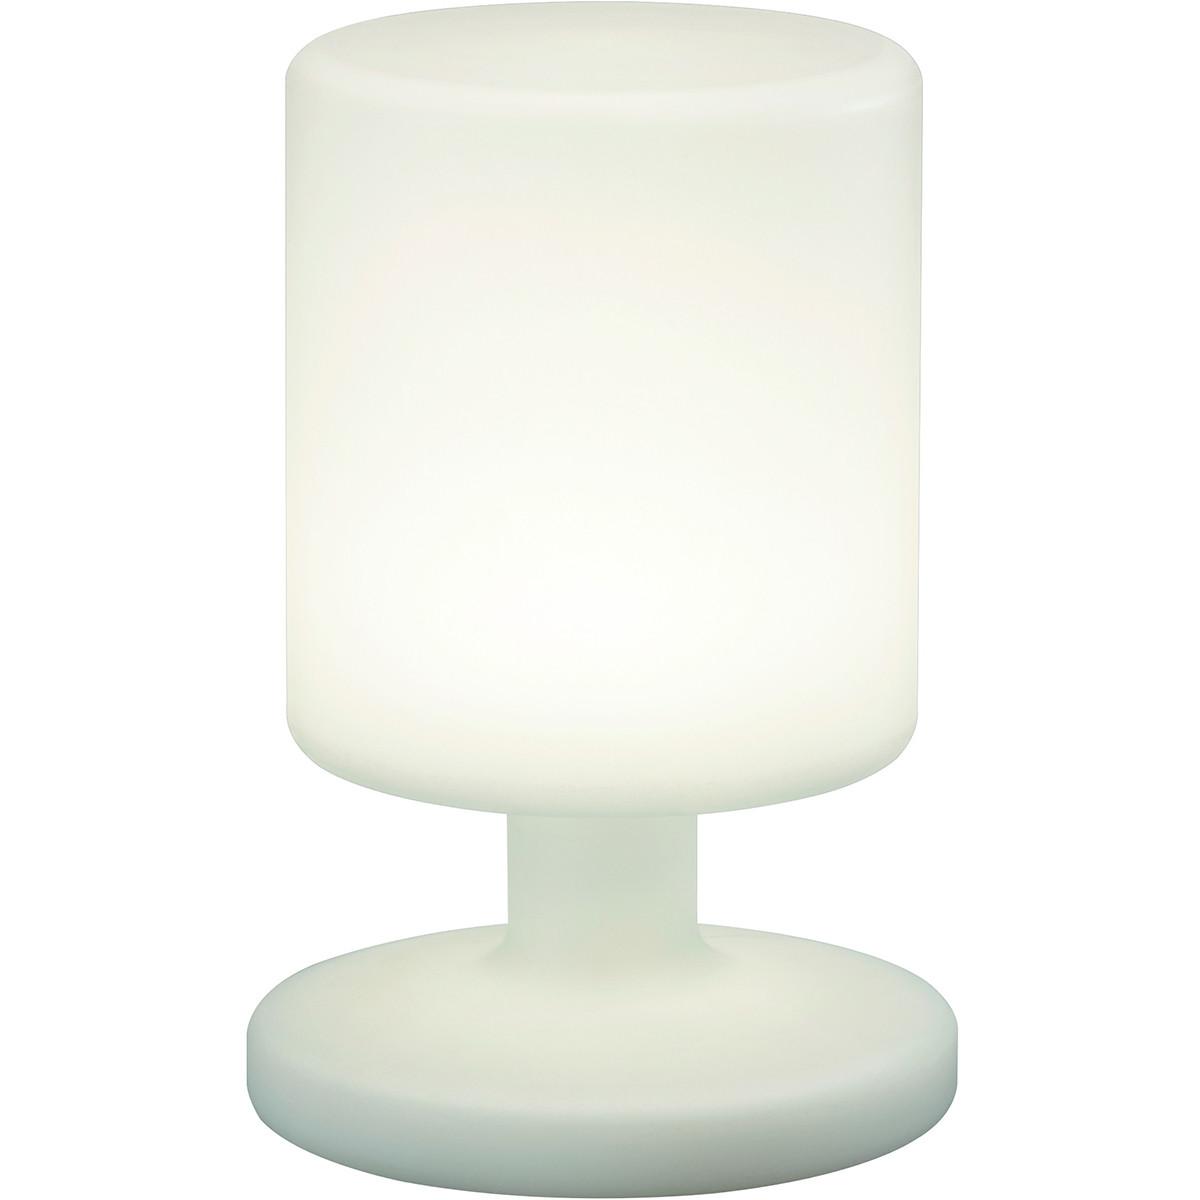 LED Tafellamp - Trion Barbary - Rond - Wit - Kunststof - Spatwaterdicht - USB Oplaadbaar